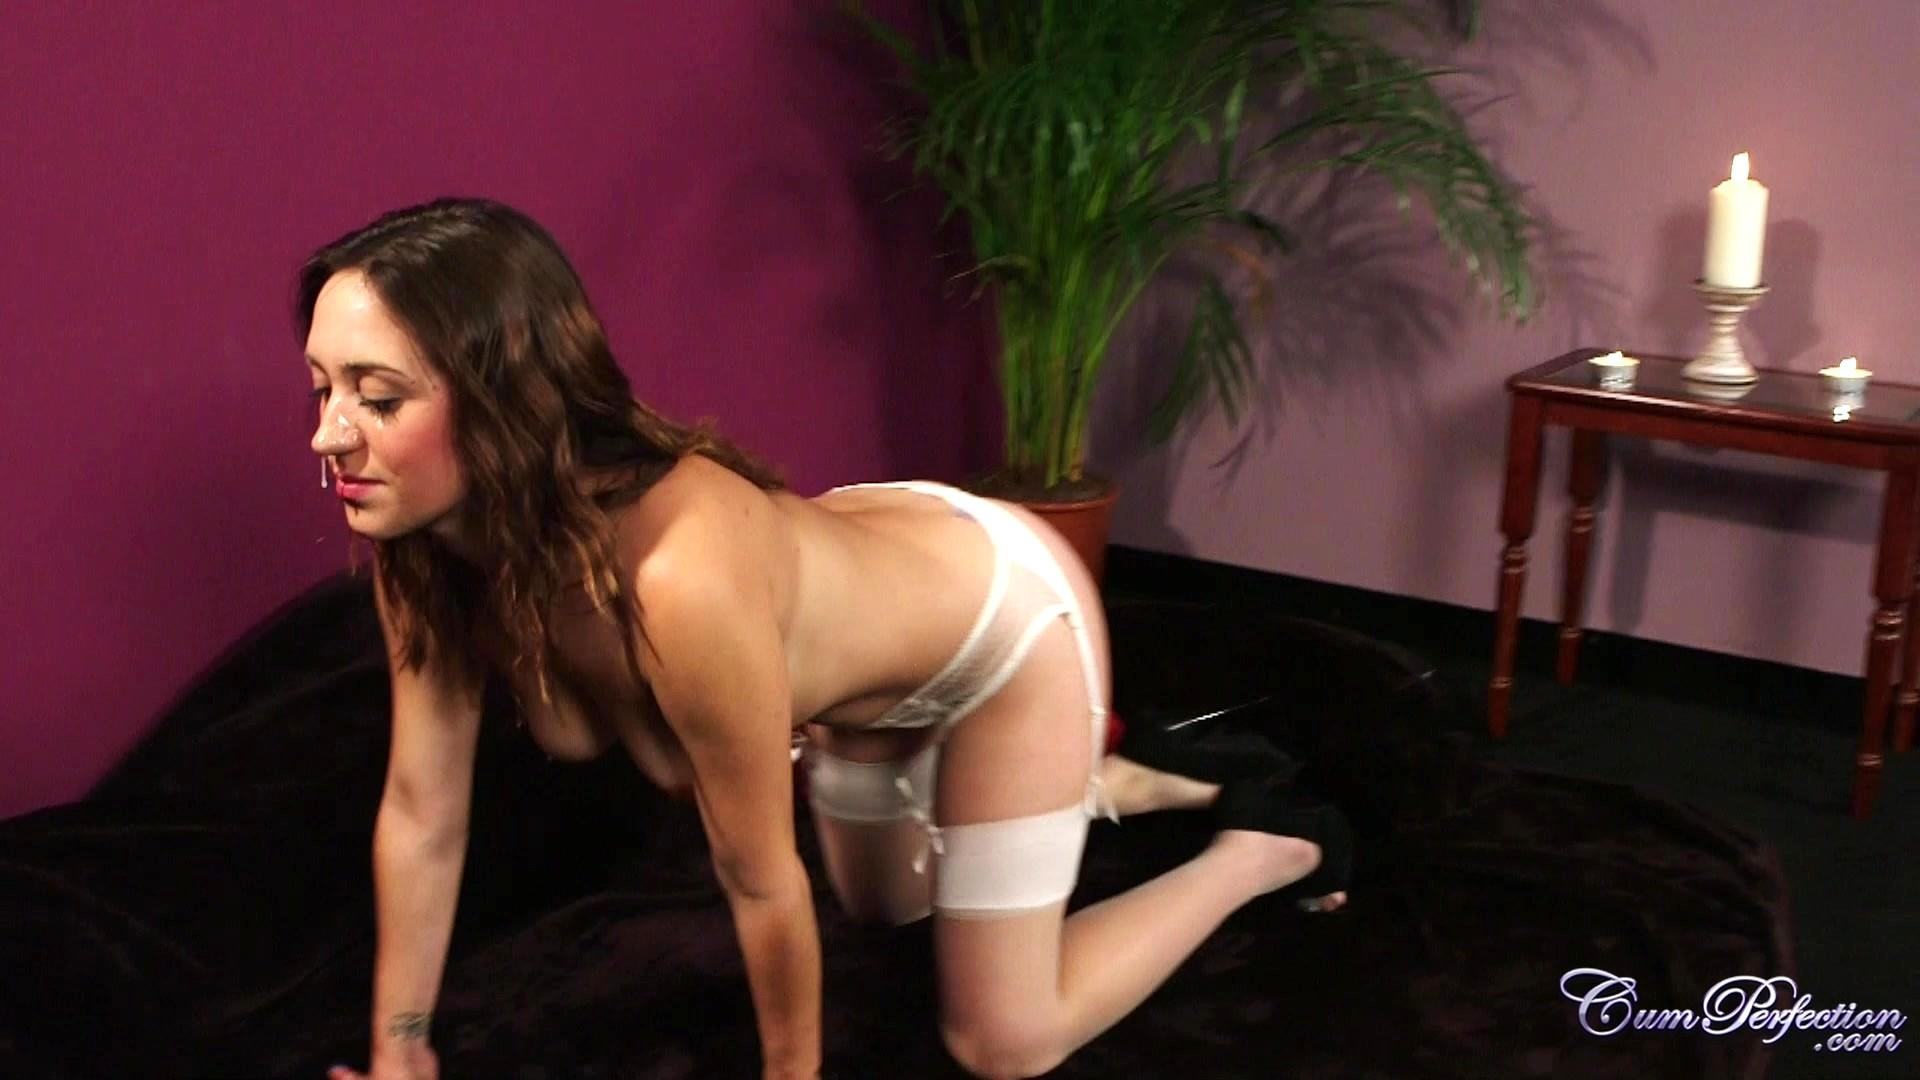 Brooke lee adams and darryl hanah real lesbian orgasms 3